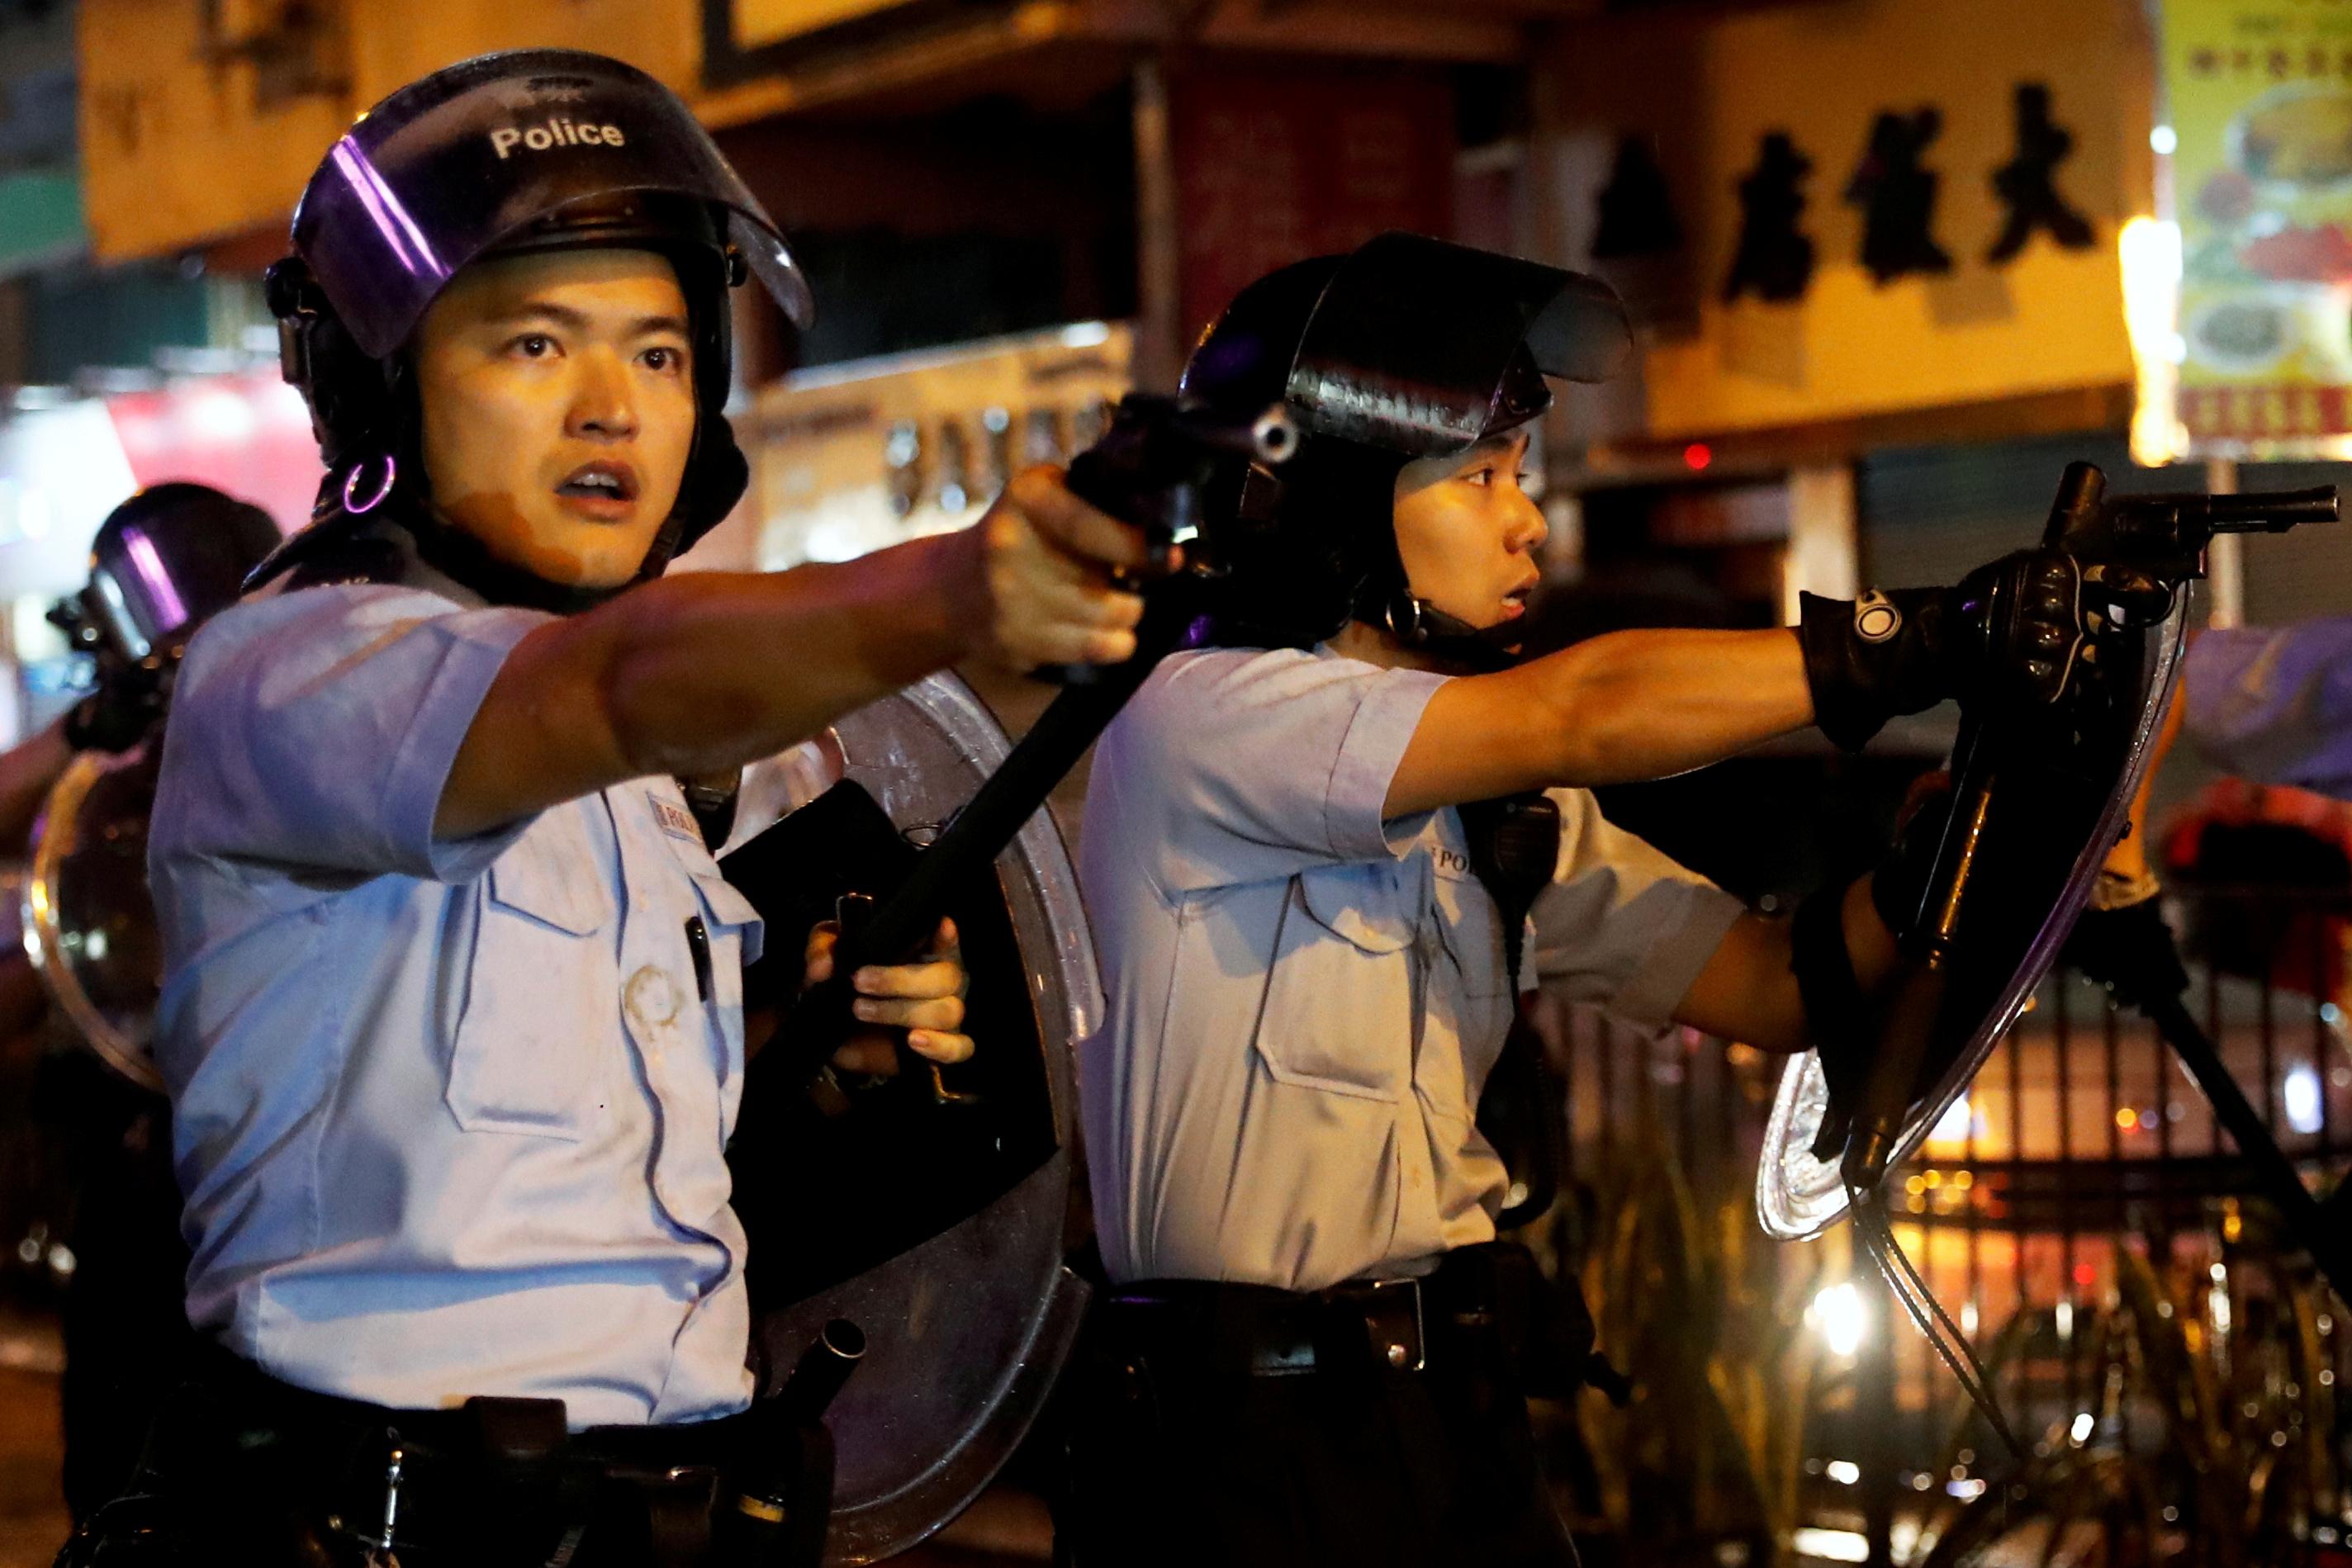 2019-08-25T000000Z_1168234091_RC1264D5F170_RTRMADP_3_HONGKONG-PROTESTS.JPG